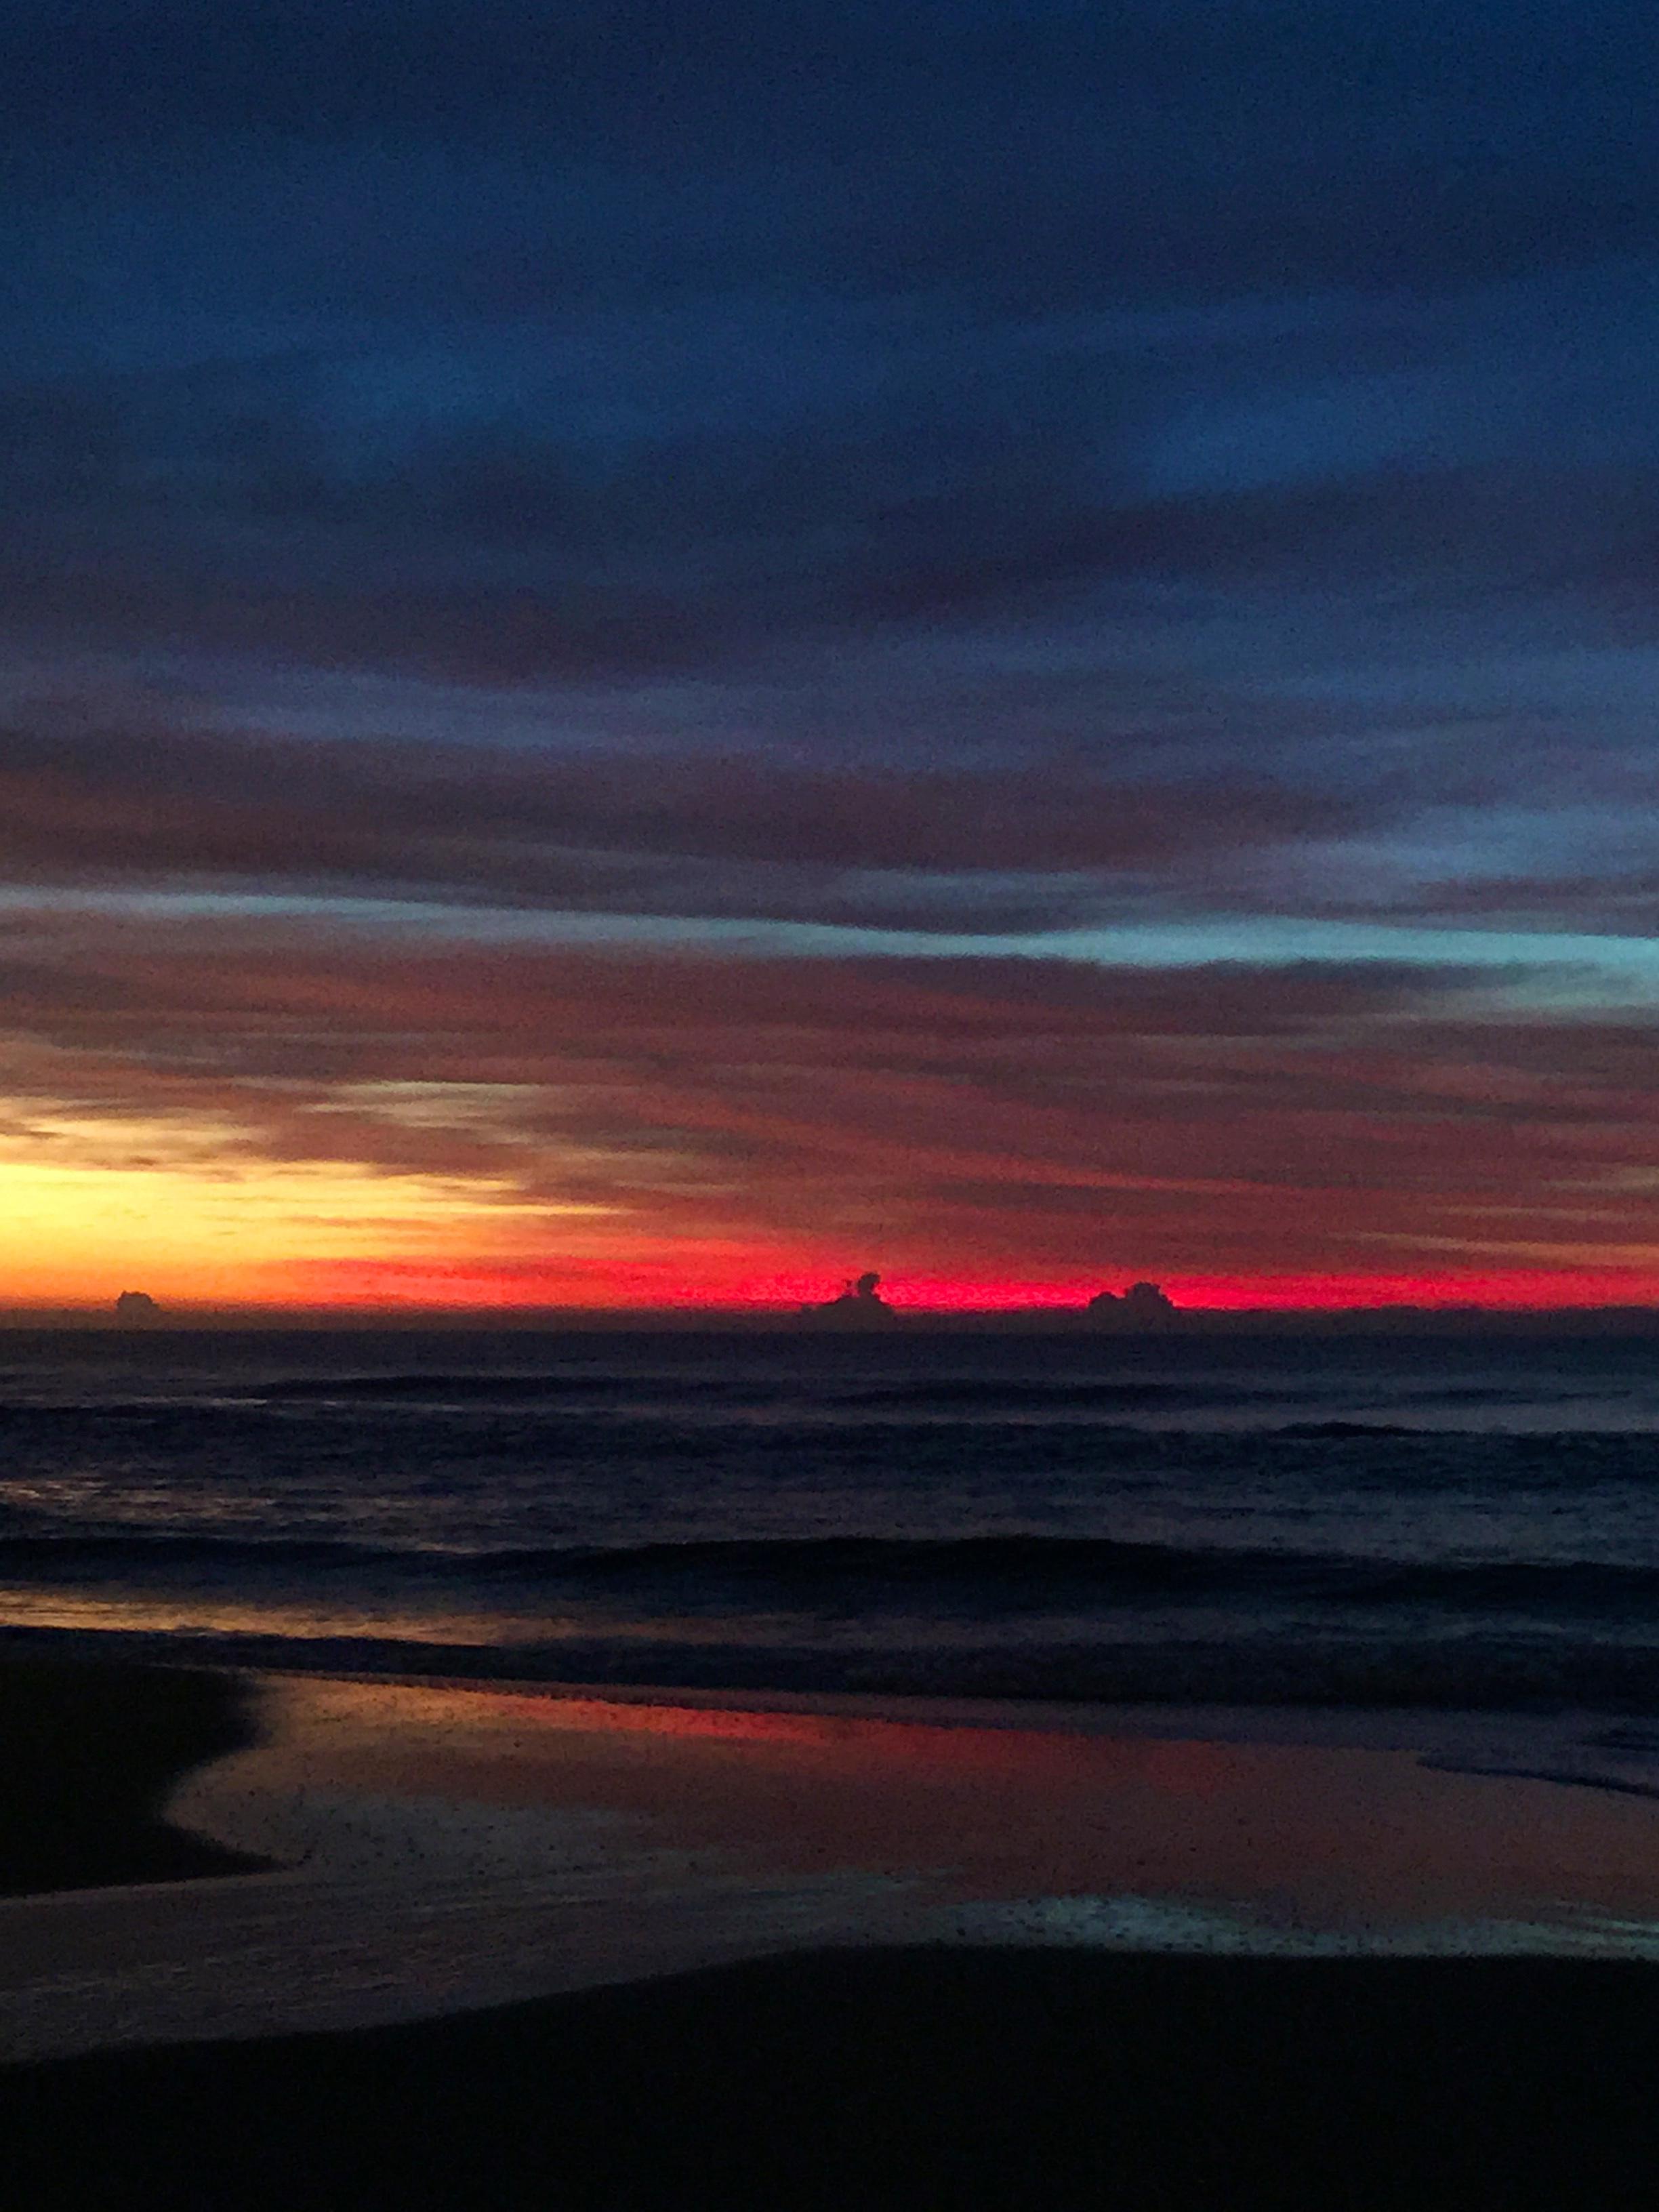 Beauty of Beginnings – February 16th